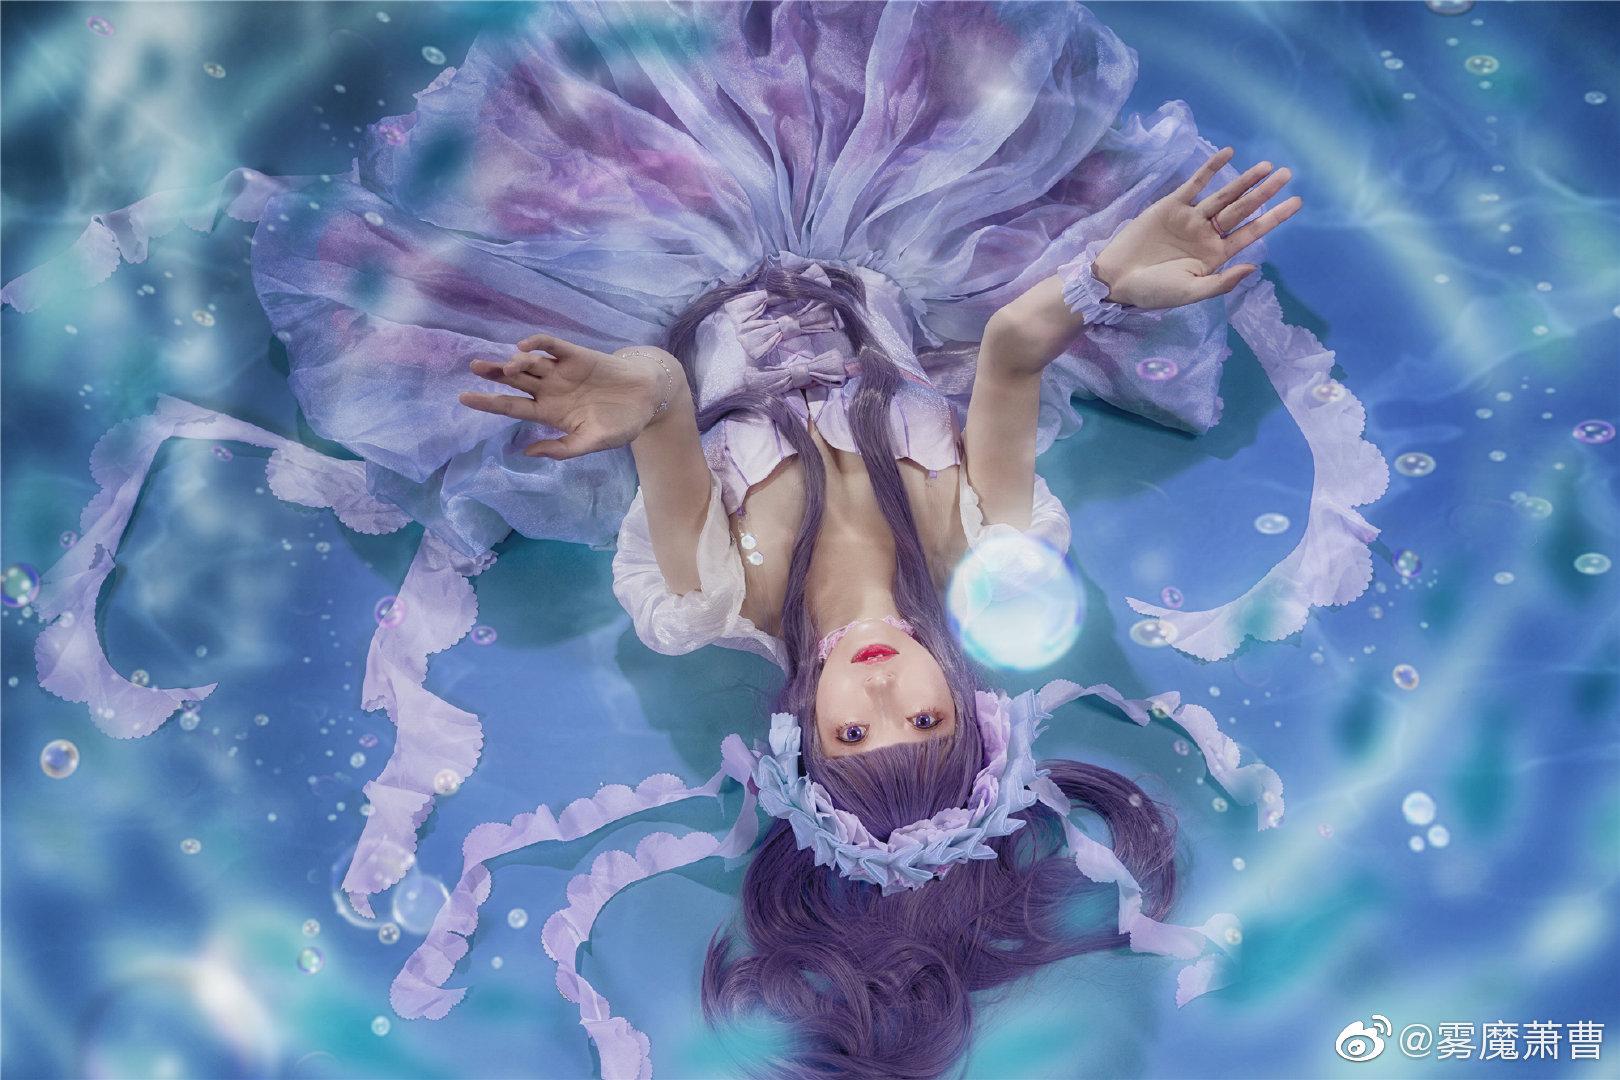 [COS]#魔卡少女樱# 大道寺知世 - 水之轮舞曲 COSPLAY-第8张